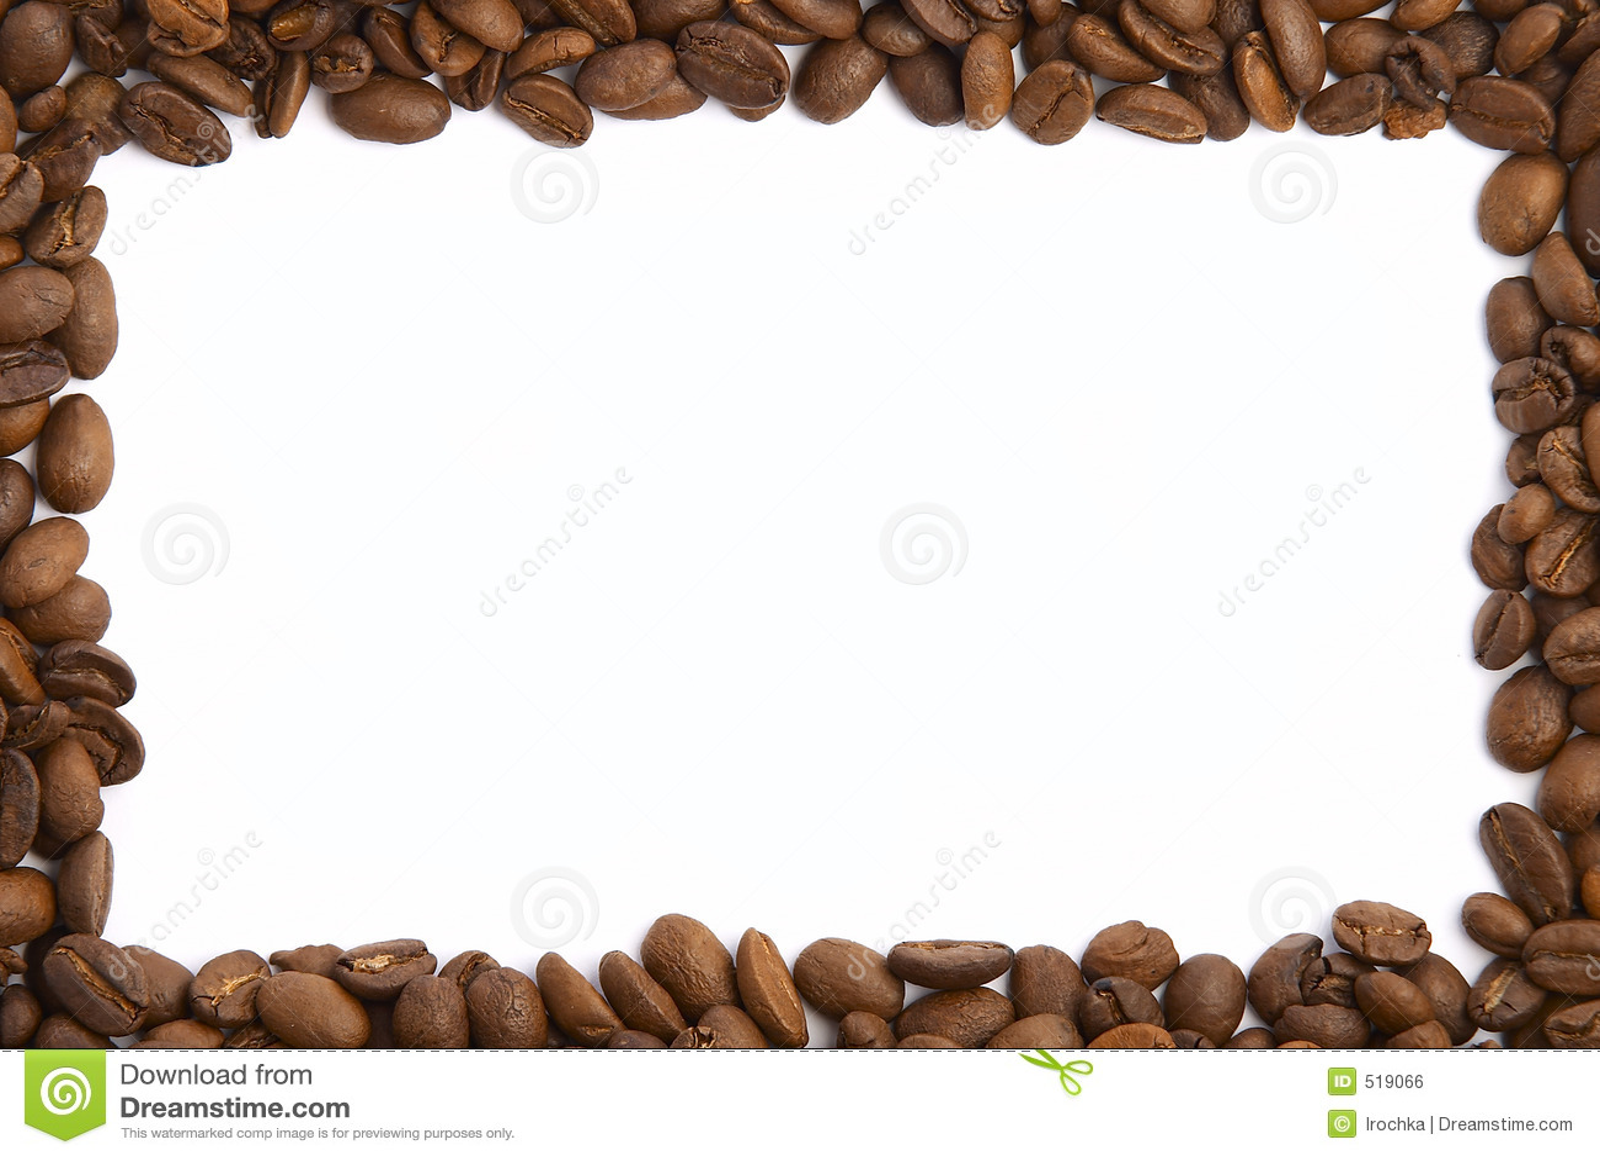 Marcos Con Granos De Cafe